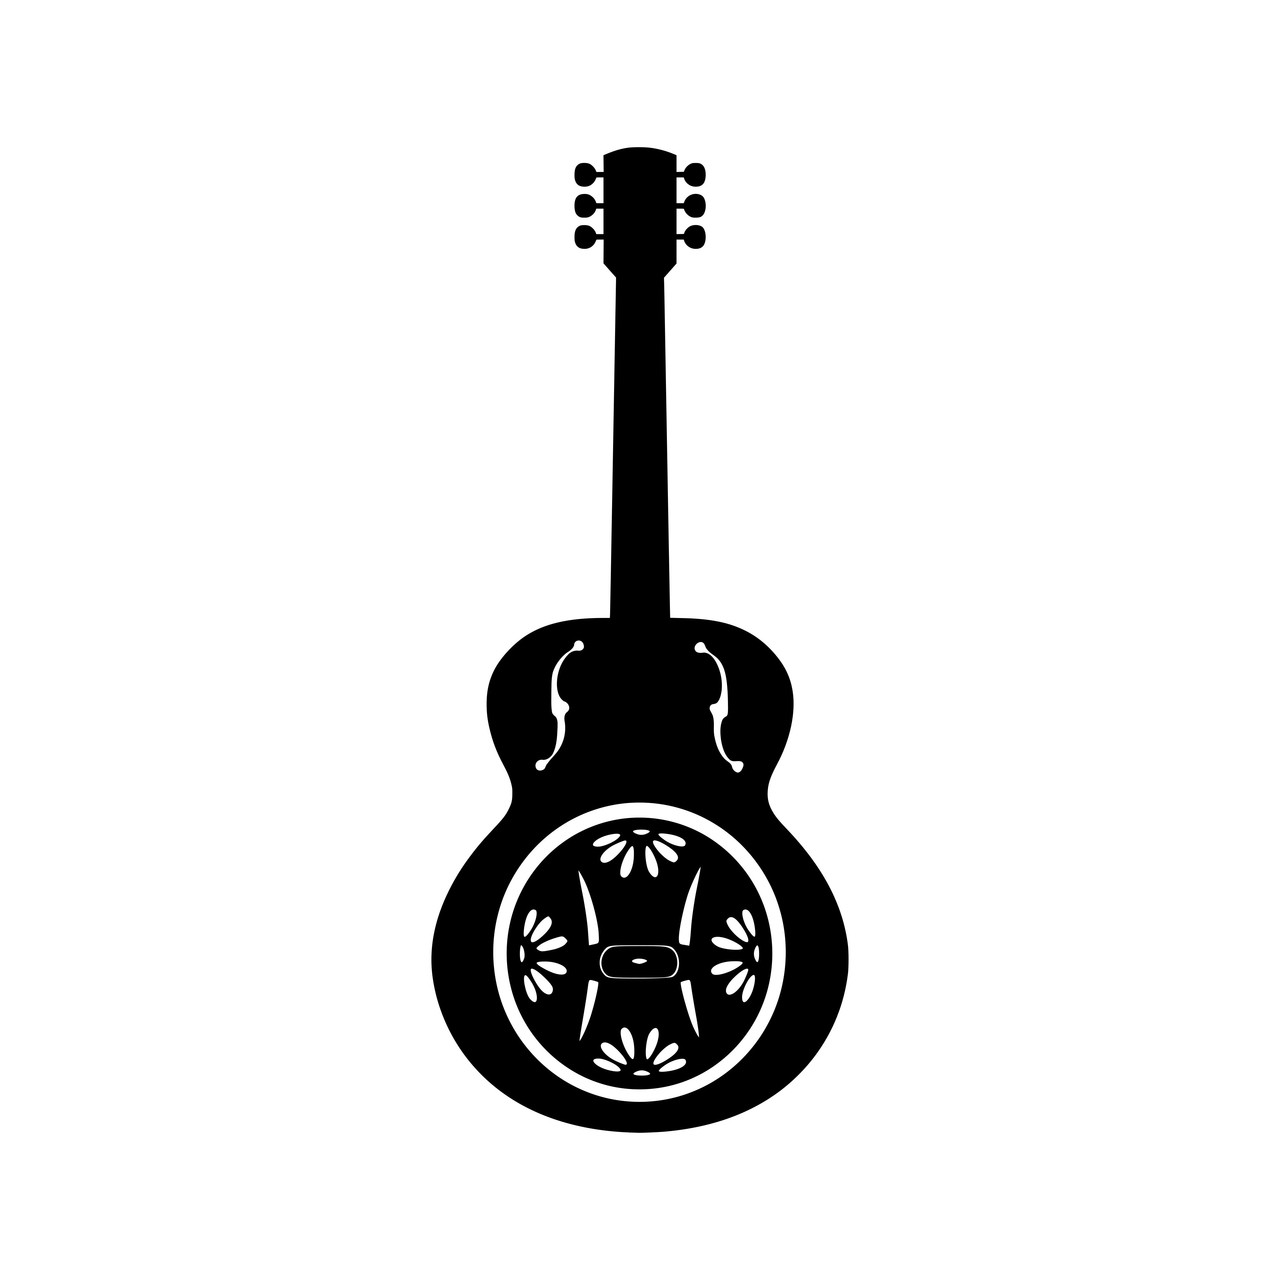 Dobro  Vinyl Decal - Guitar Bluegrass Country Music - Die Cut Sticker